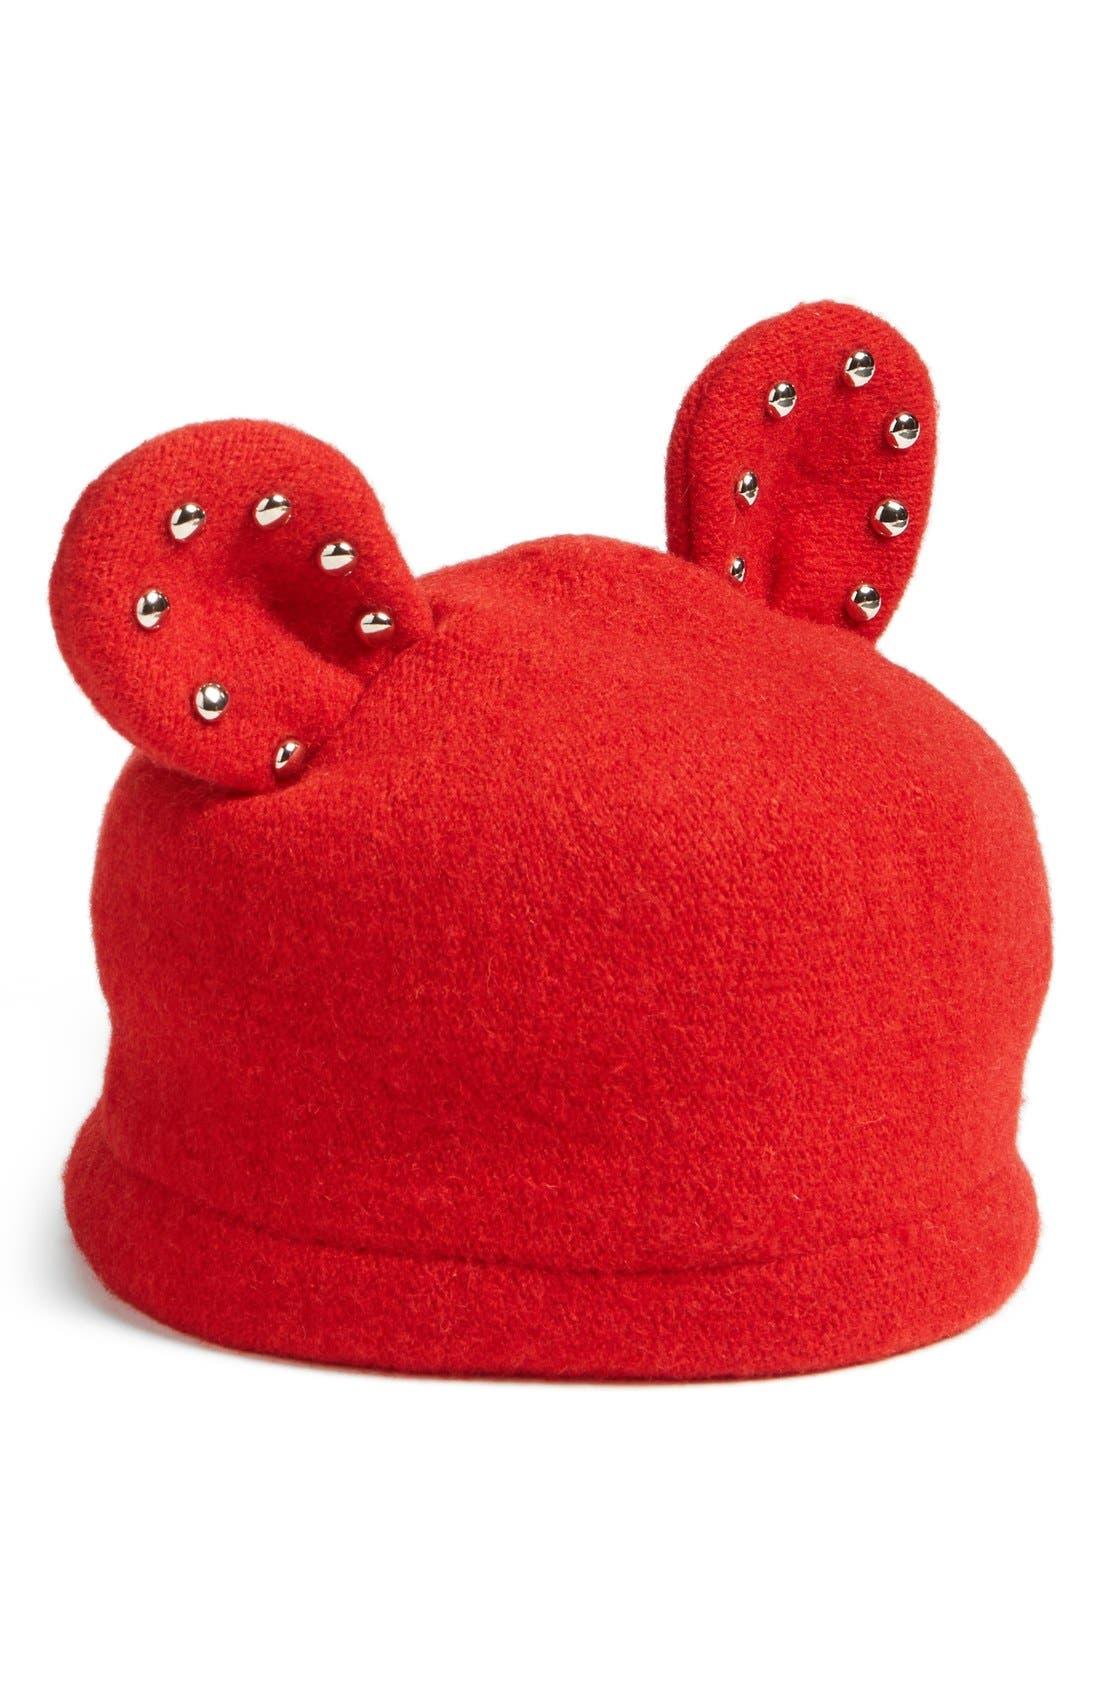 Alternate Image 1 Selected - Helene BermanStudded Ears WoolBlend Cap